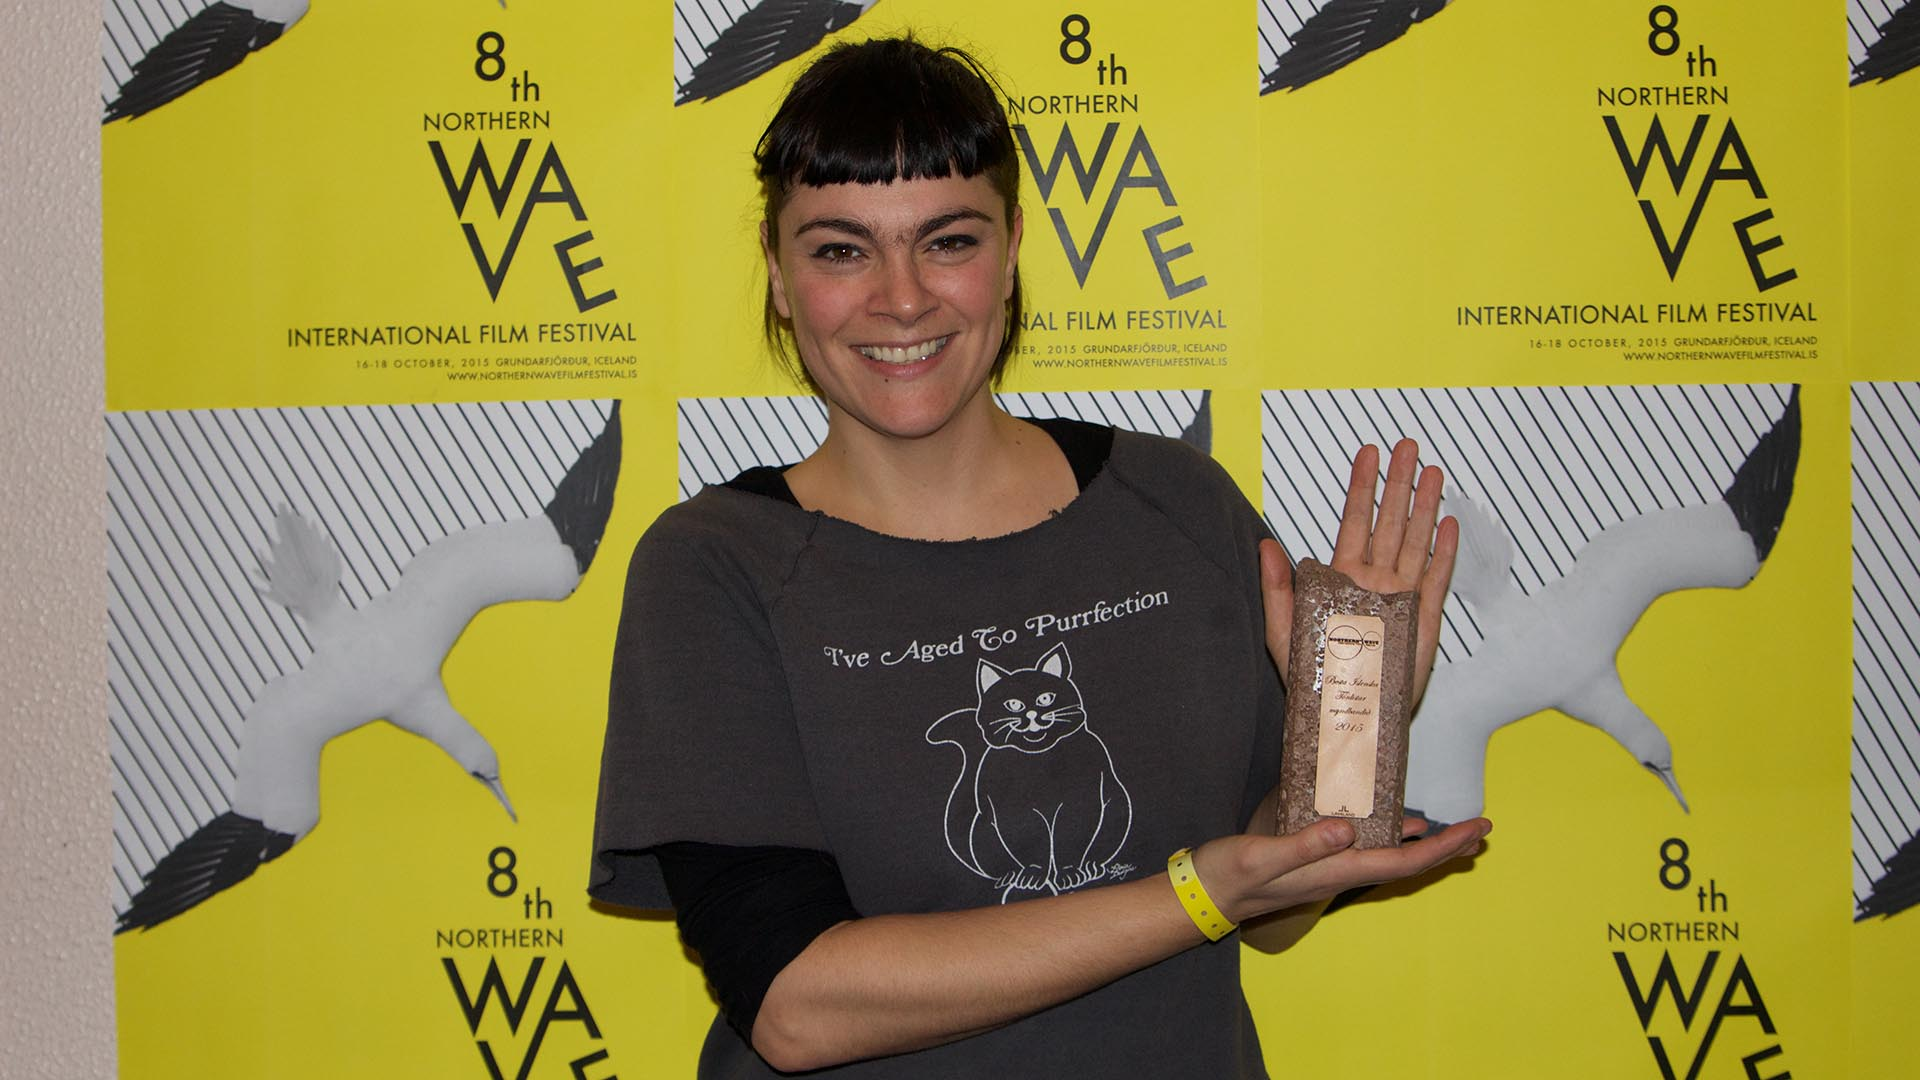 Northern Wave International Film Festival, winner 2015